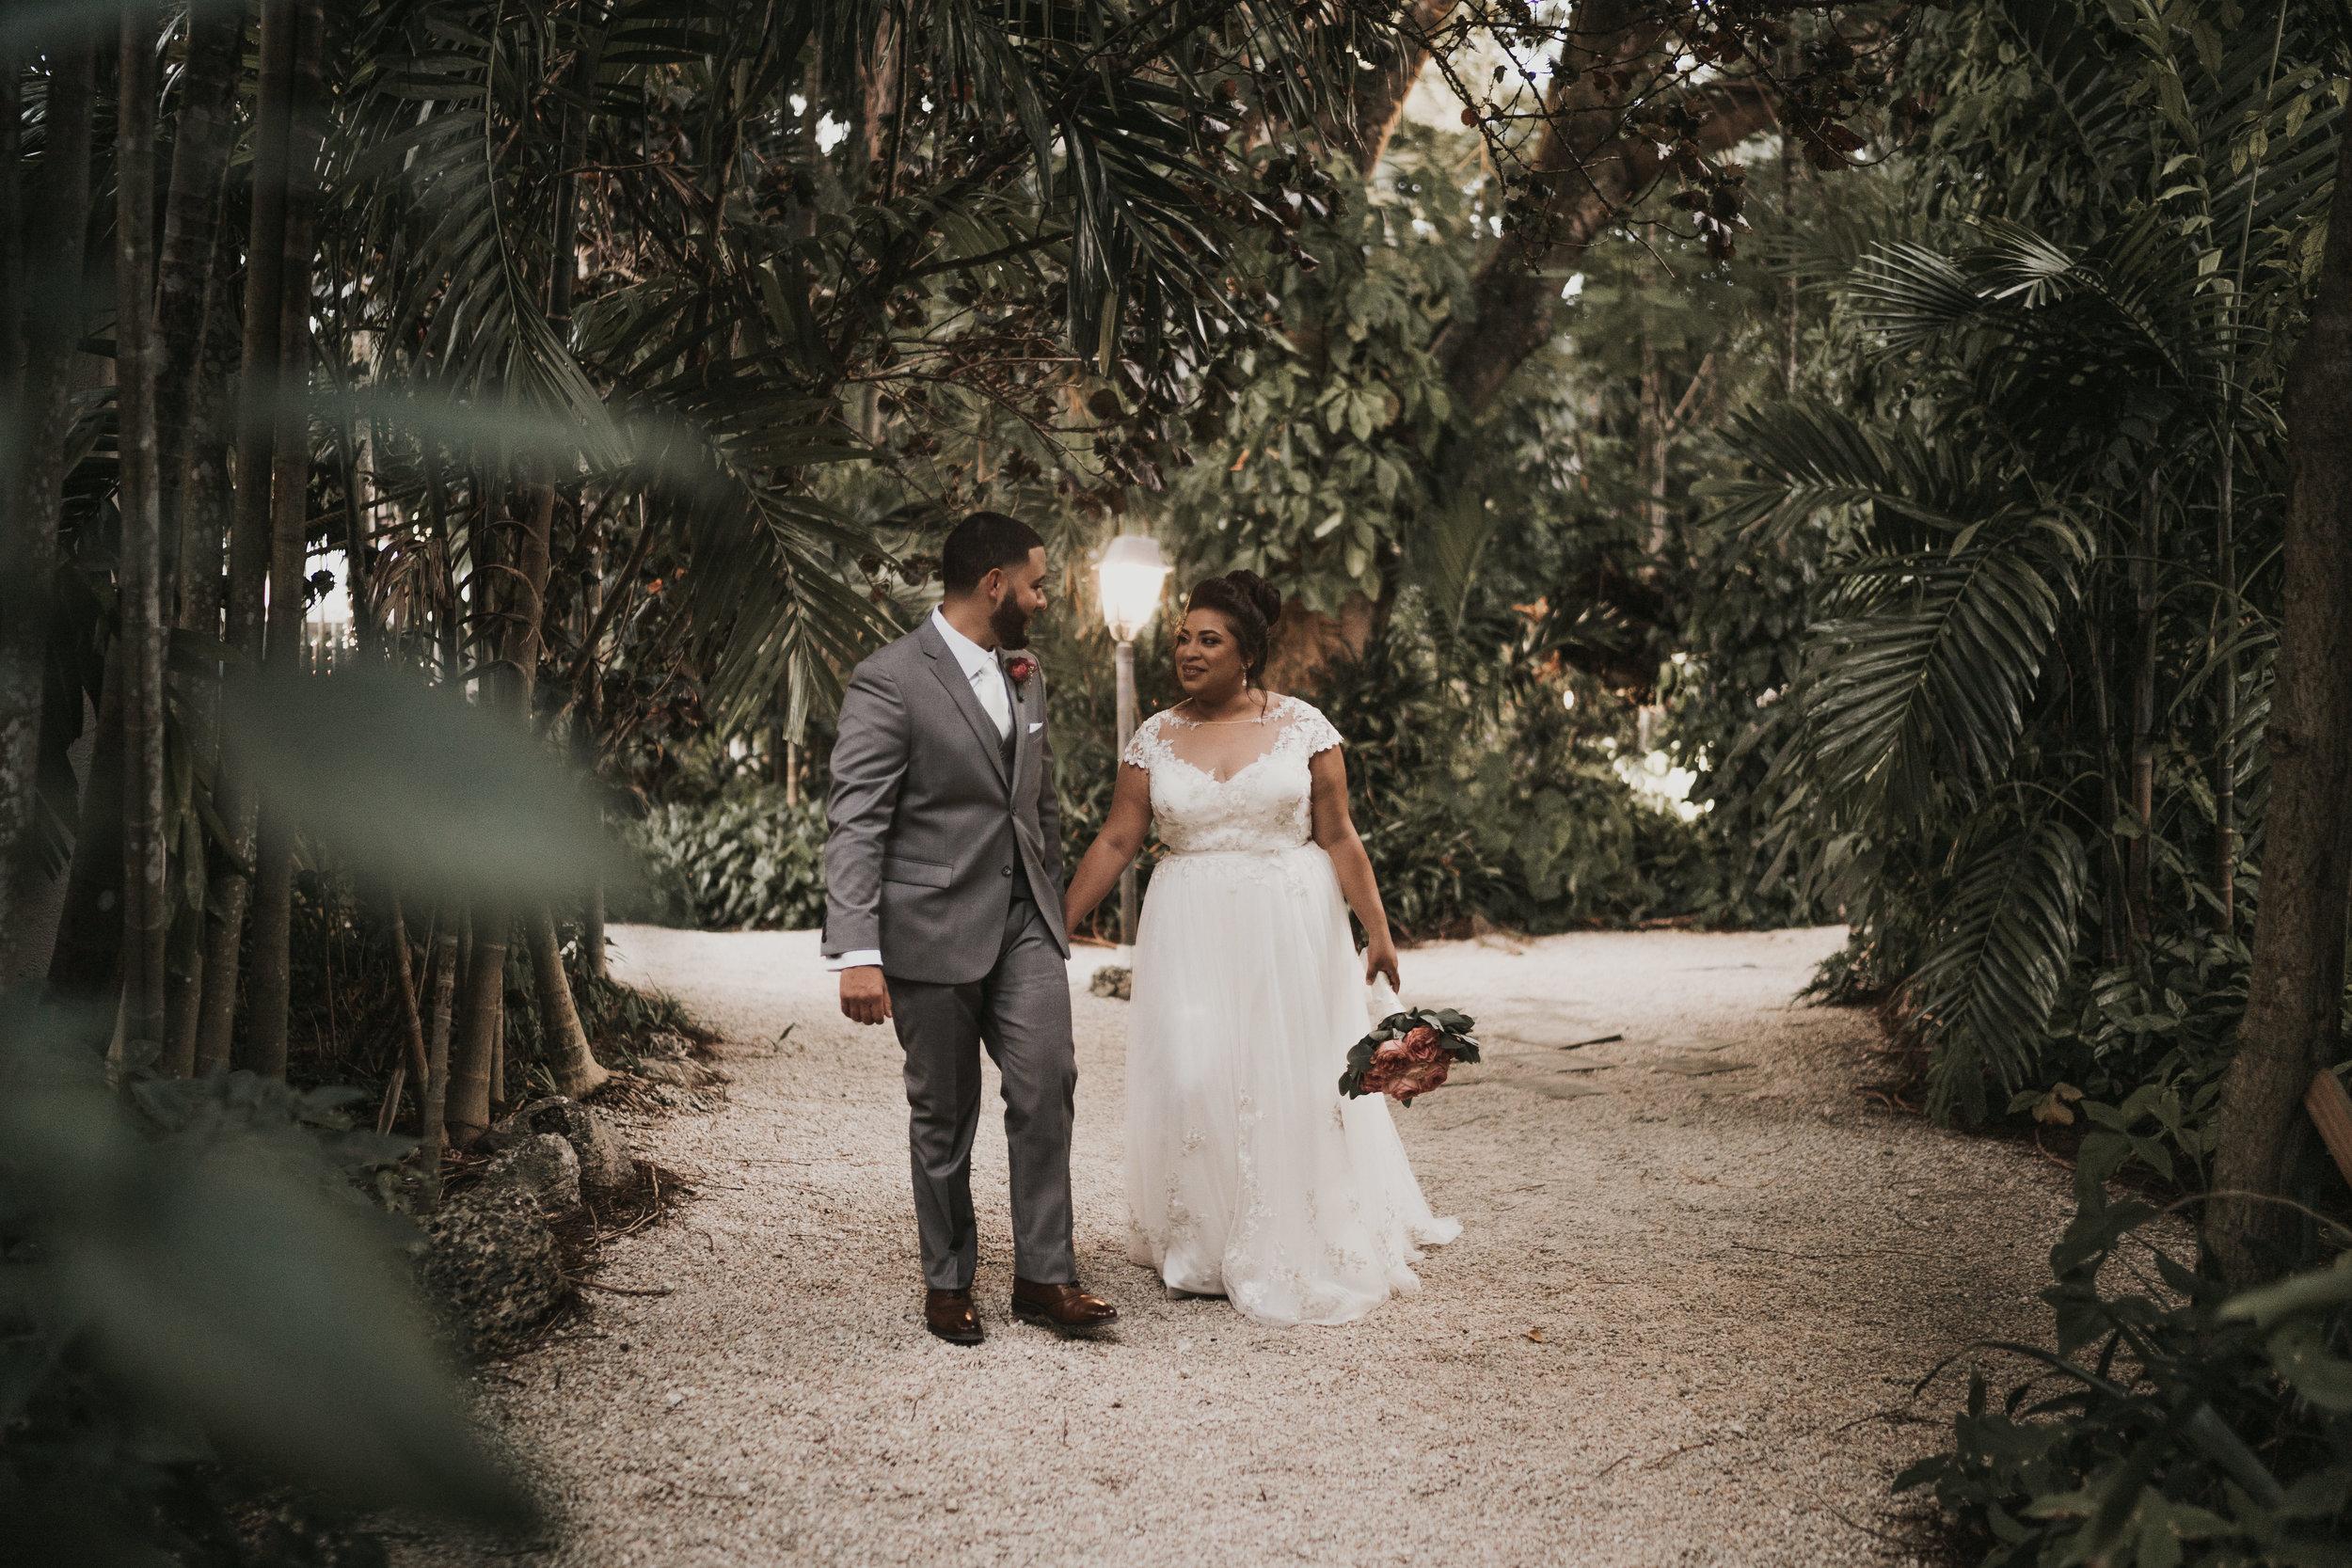 376MICHI&GABEWEDDINGDAY(WeddingFinal).jpg